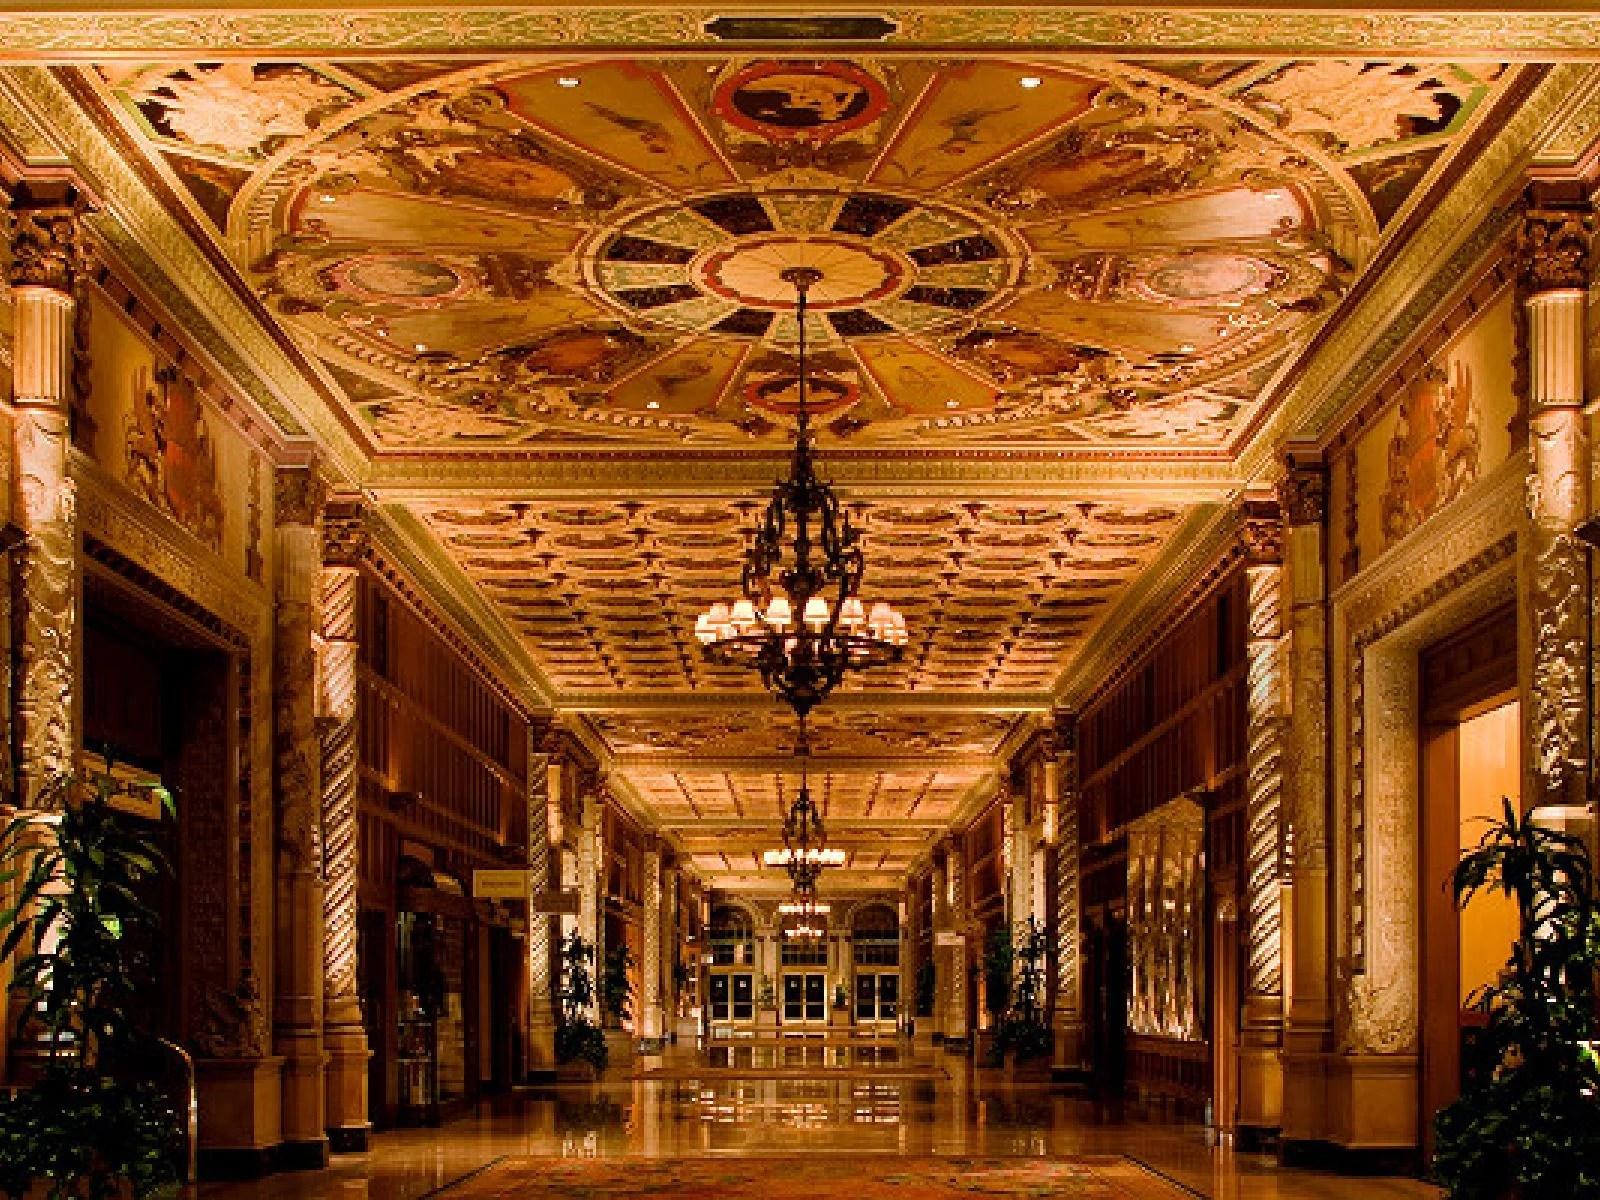 La Millennium Biltmore Hotel